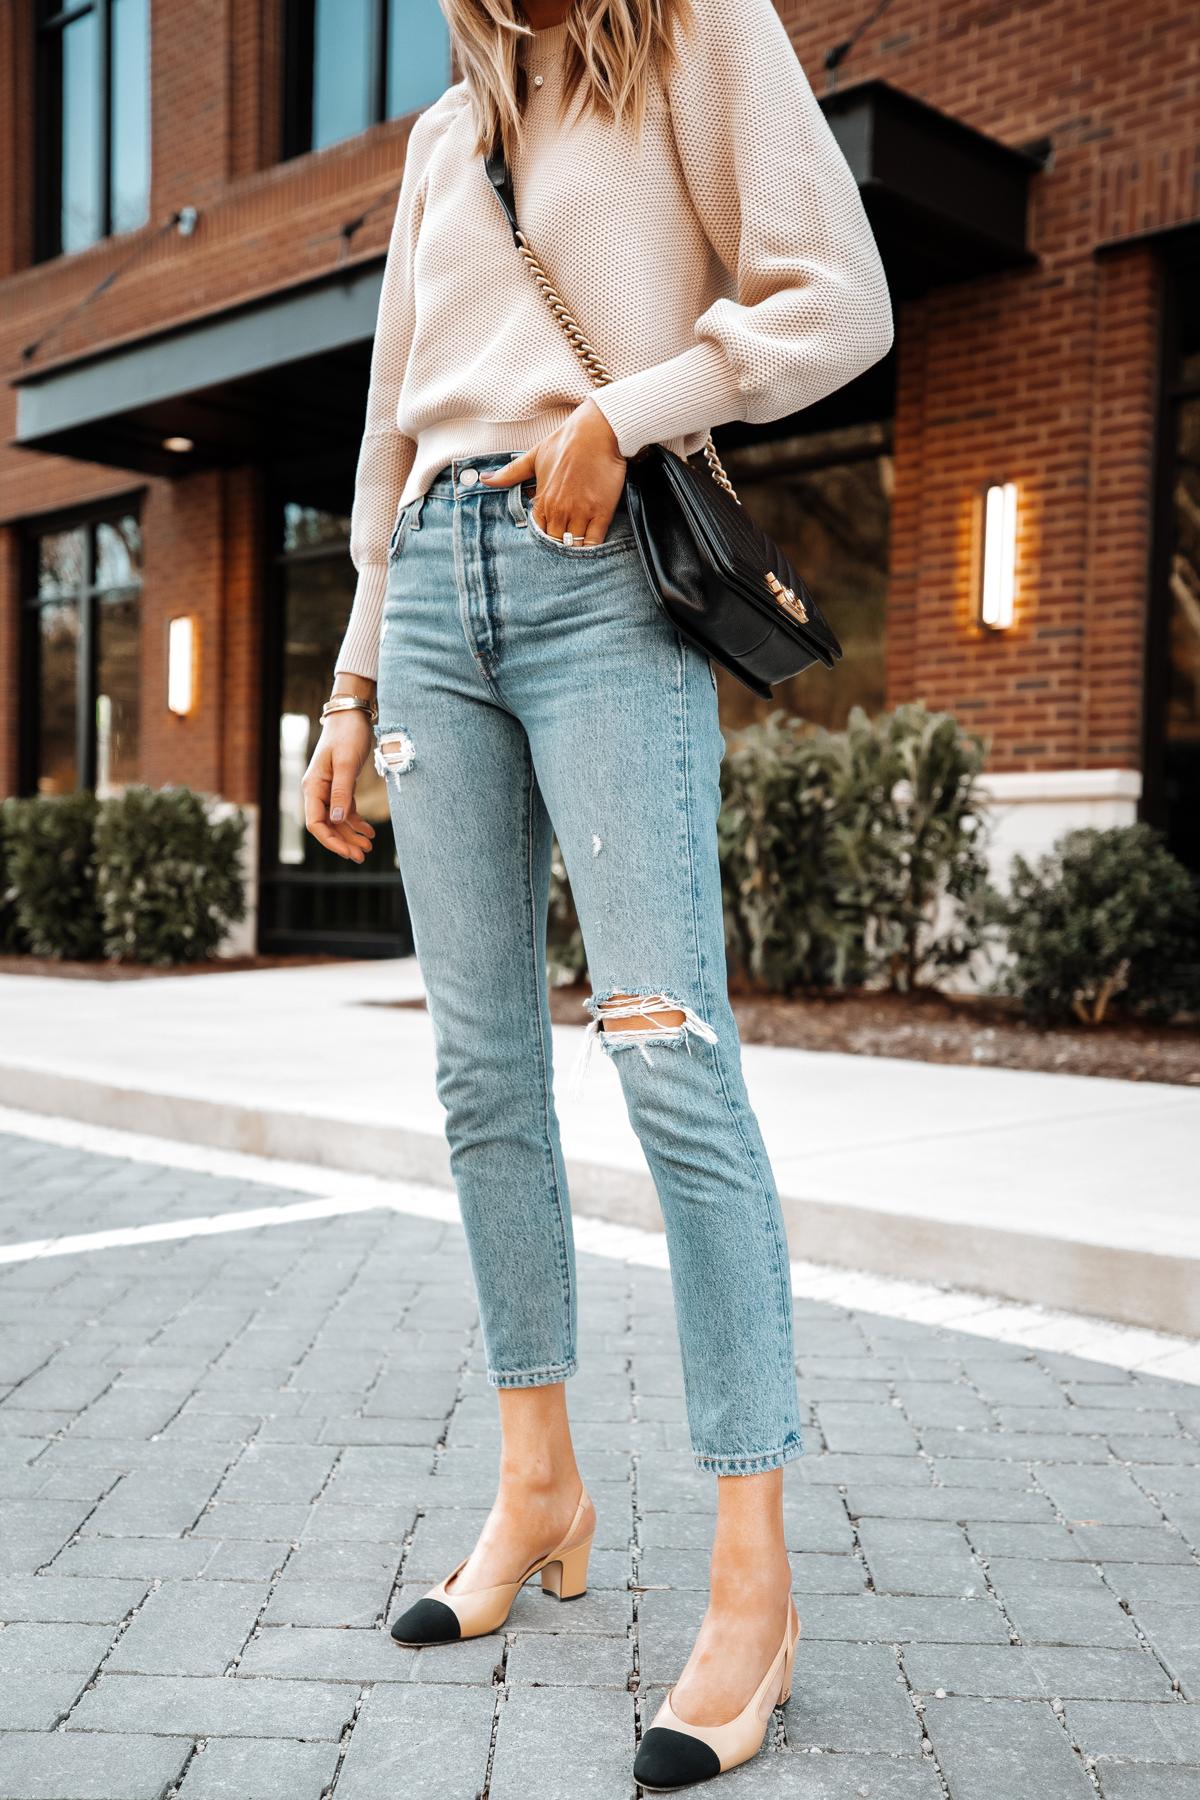 Fashion Jackson Wearing Ann Taylor Beige Knit Sweater Levis Ripped Jeans Chanel Slingbacks Chanel Black Boy Bag